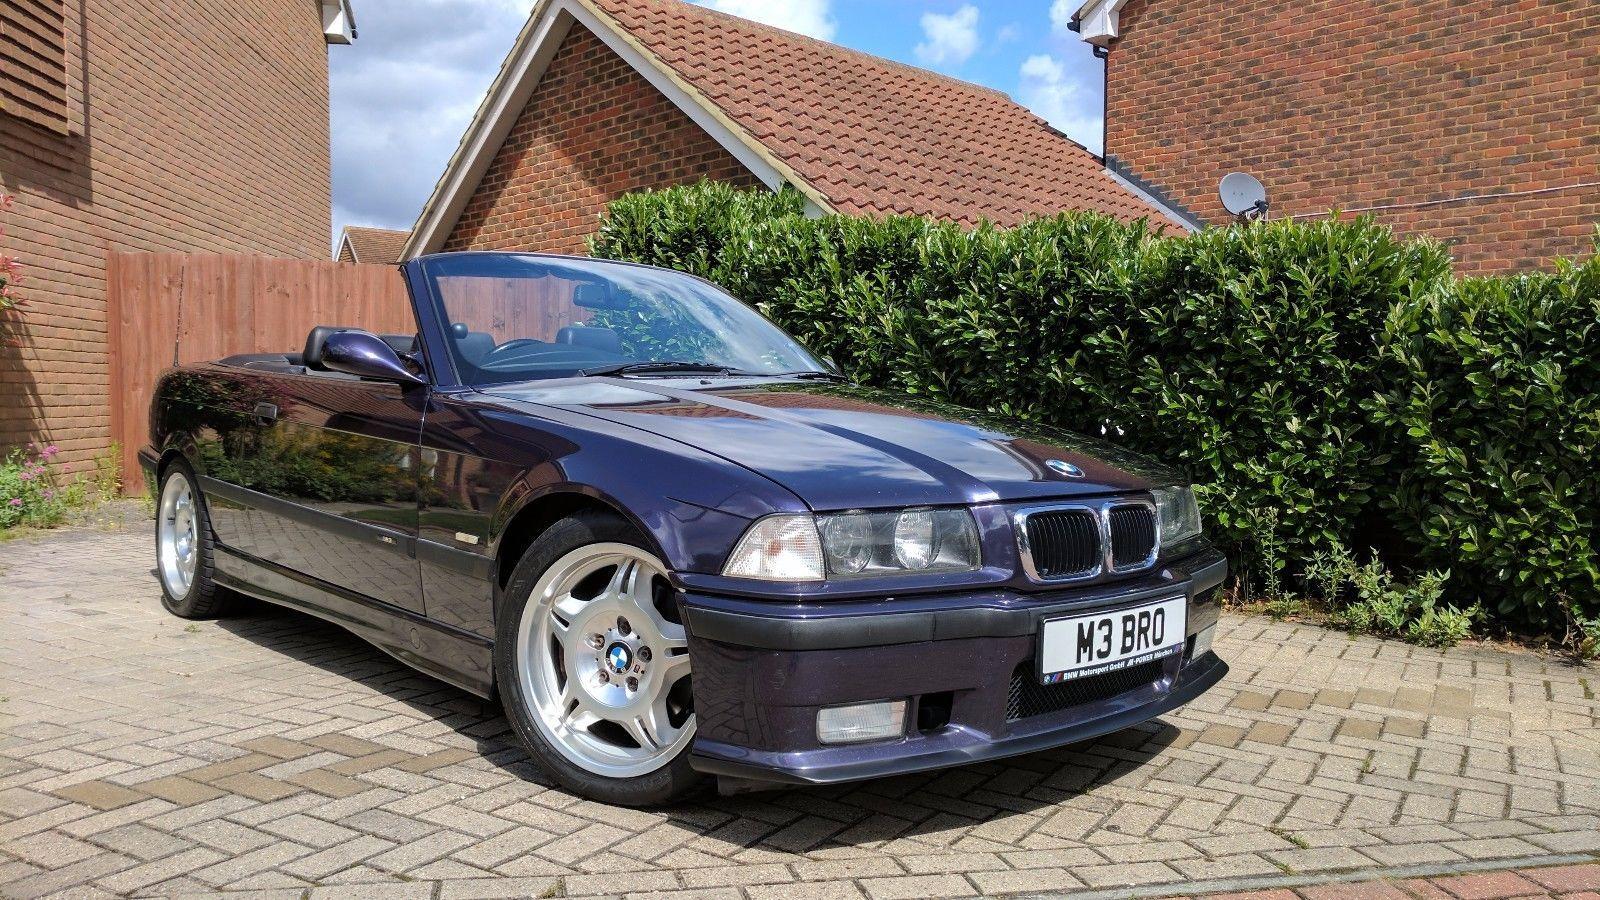 bmw m3 e36 evo cabriolet convertible techno violet fsh vgc hardtop 1998 cabrio [ 1600 x 900 Pixel ]